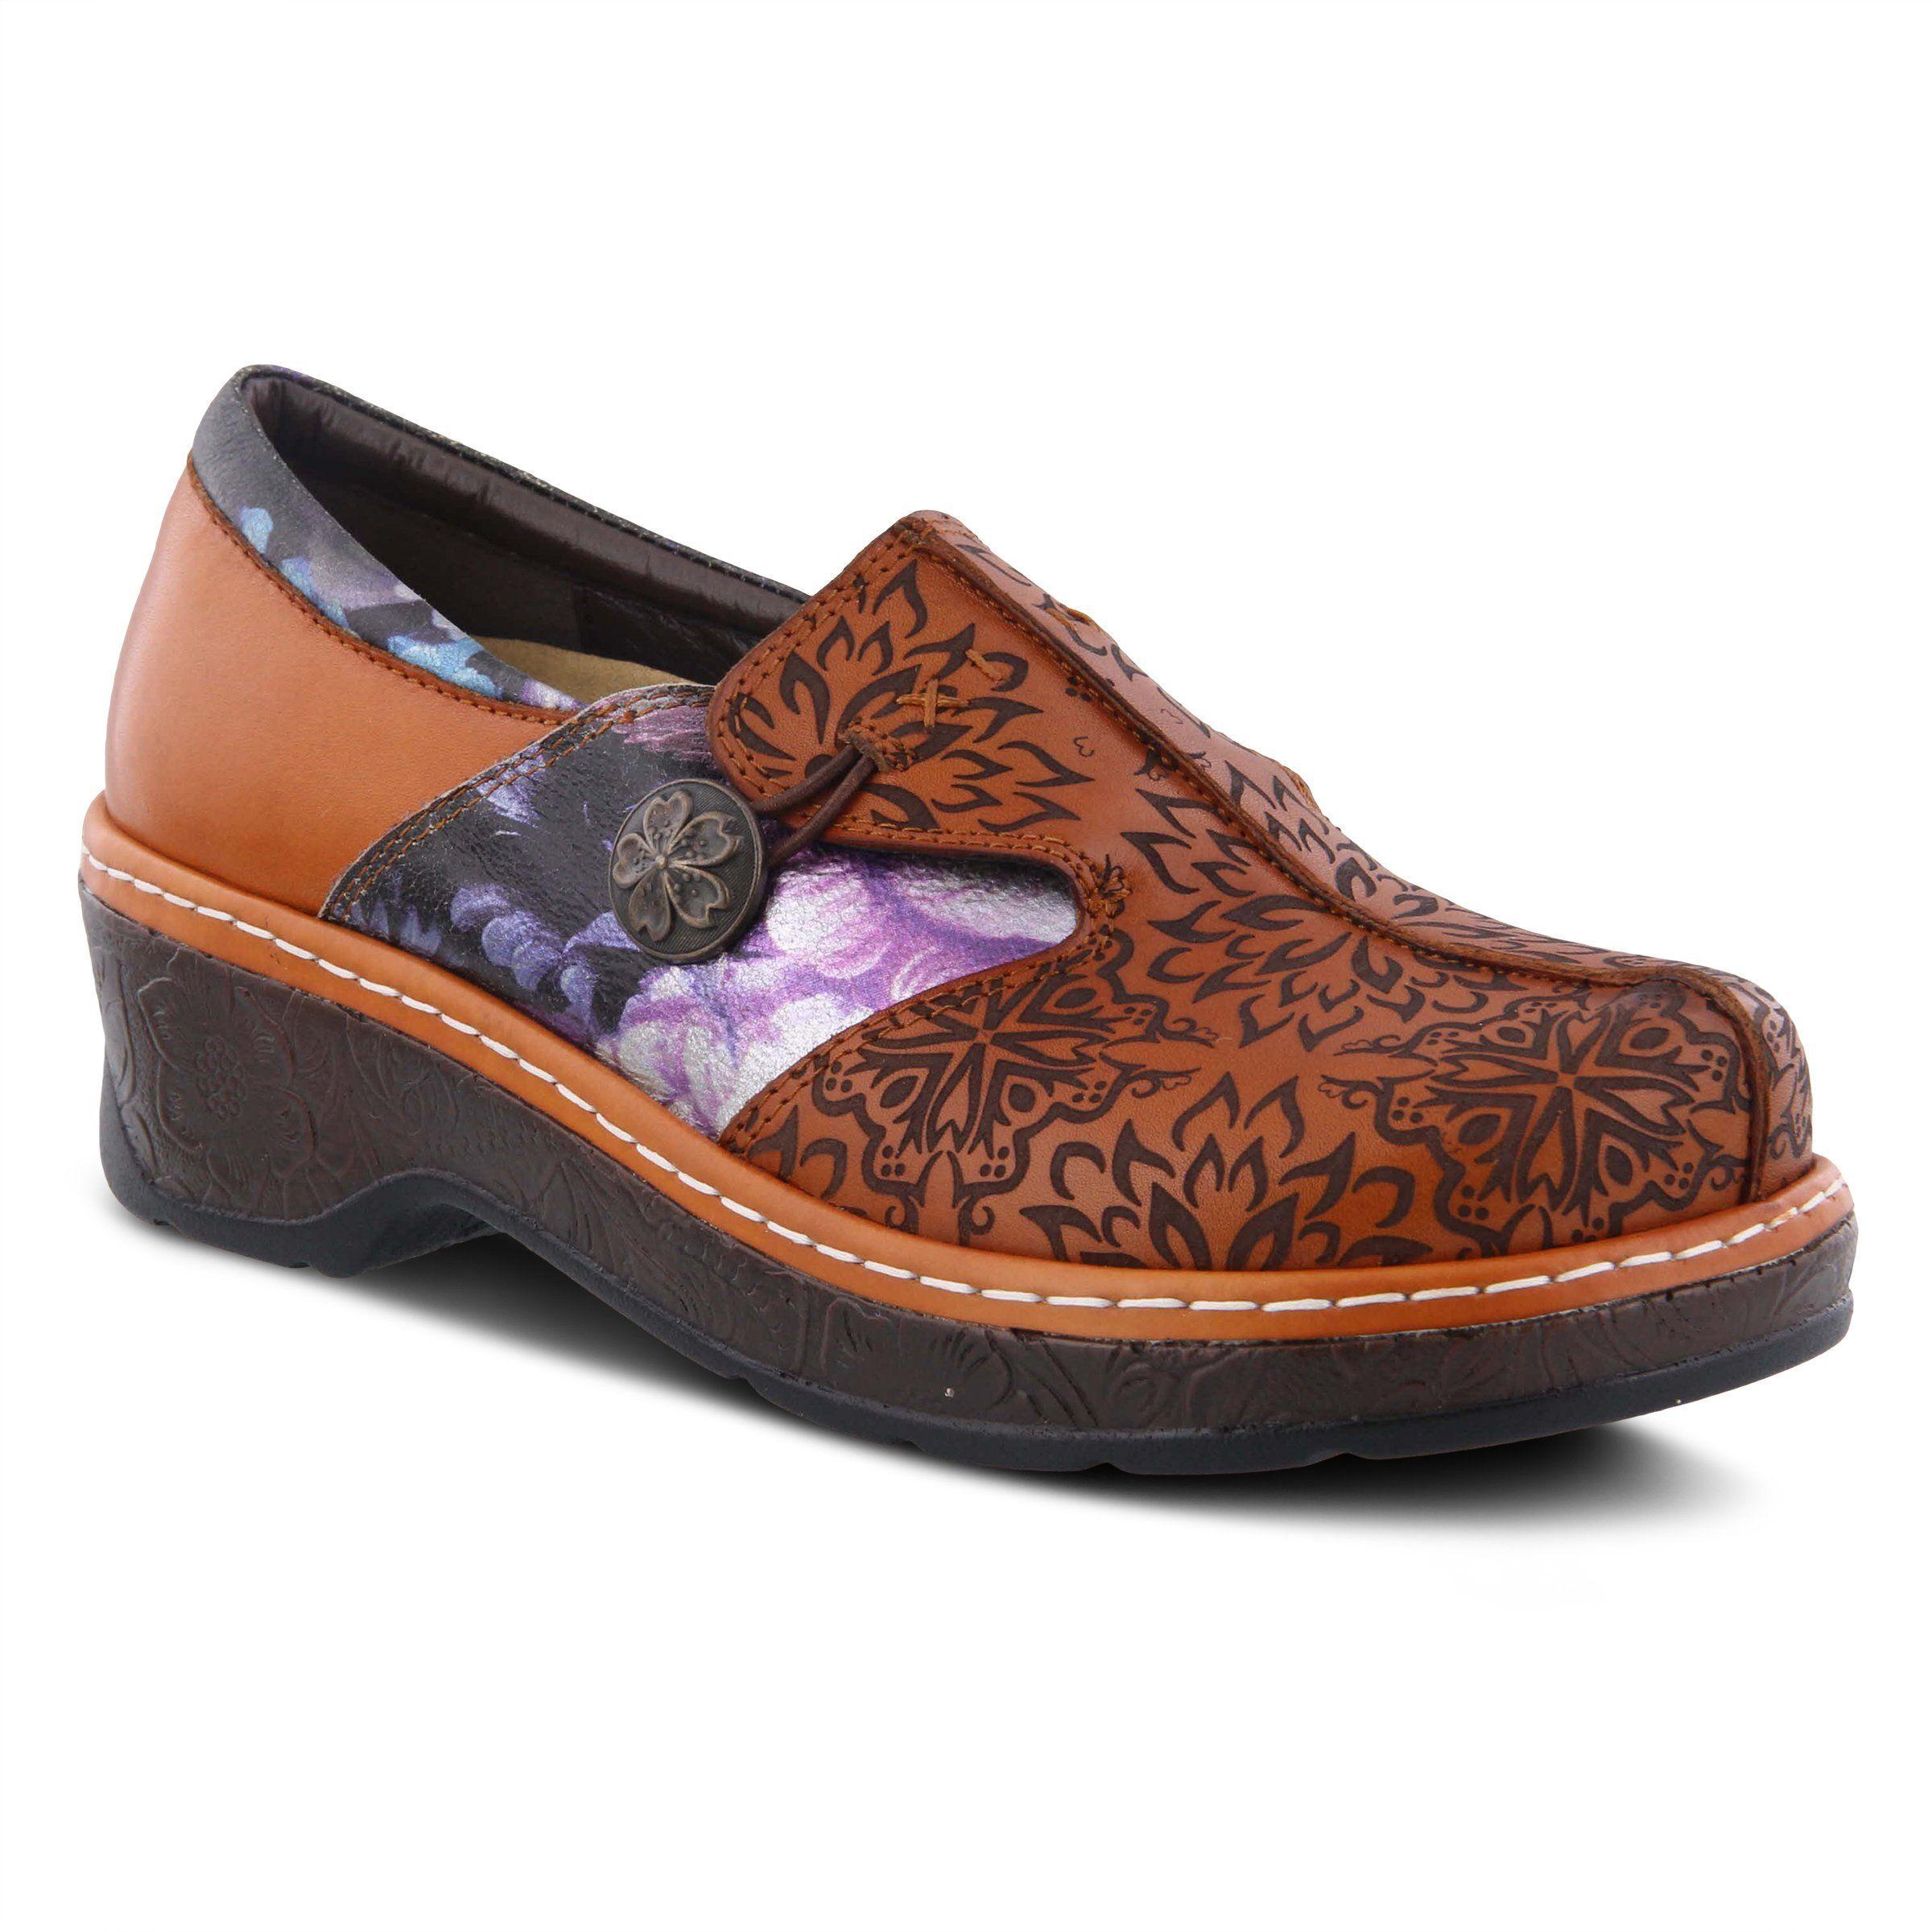 Flames clog leather clogs clogs spring step shoes